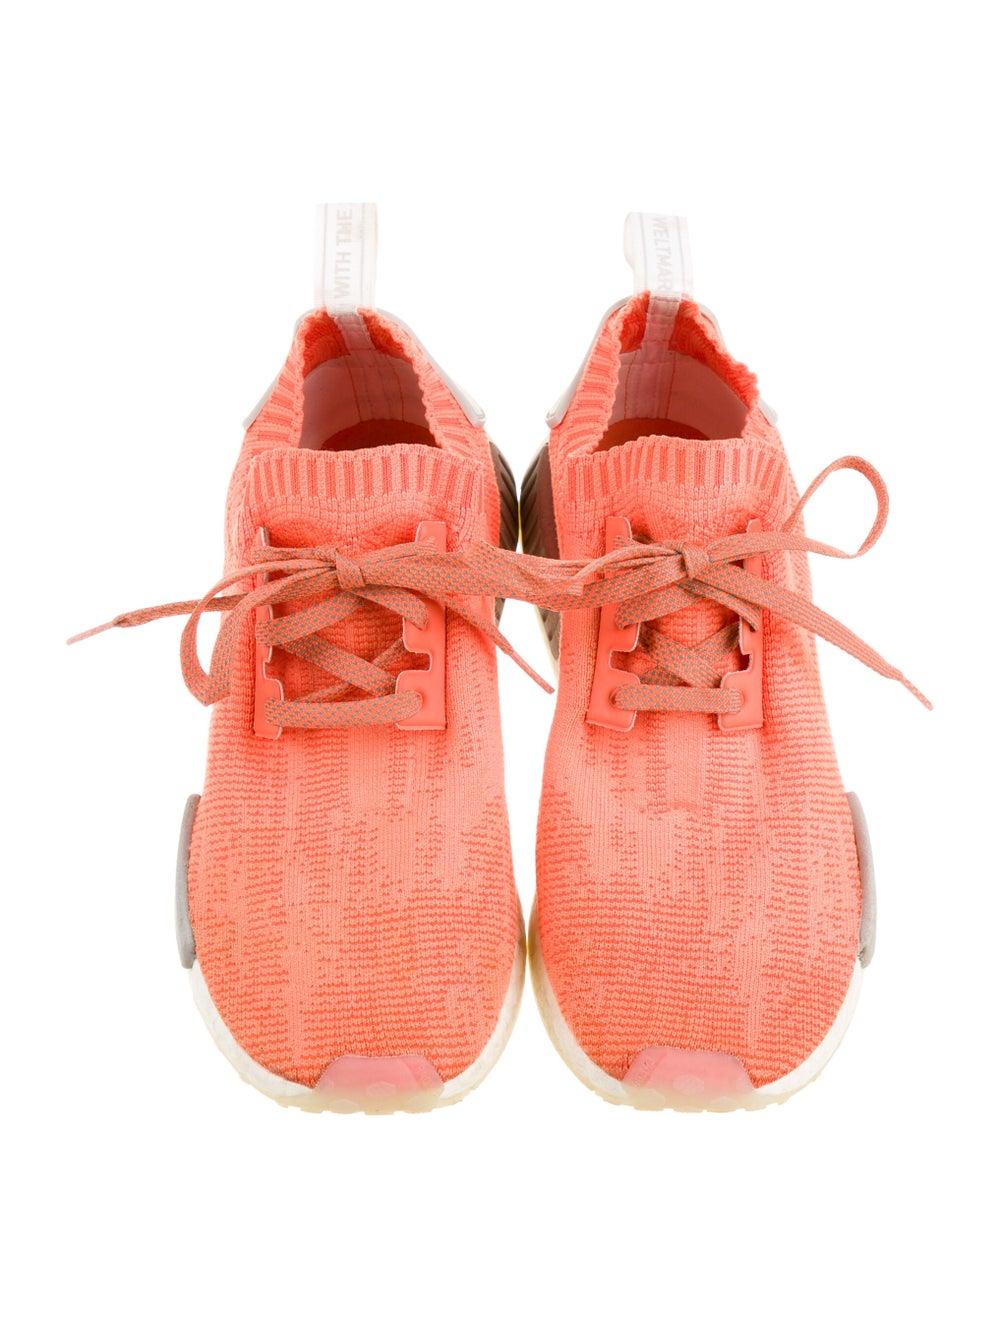 Adidas Athletic Sneakers Orange - image 3